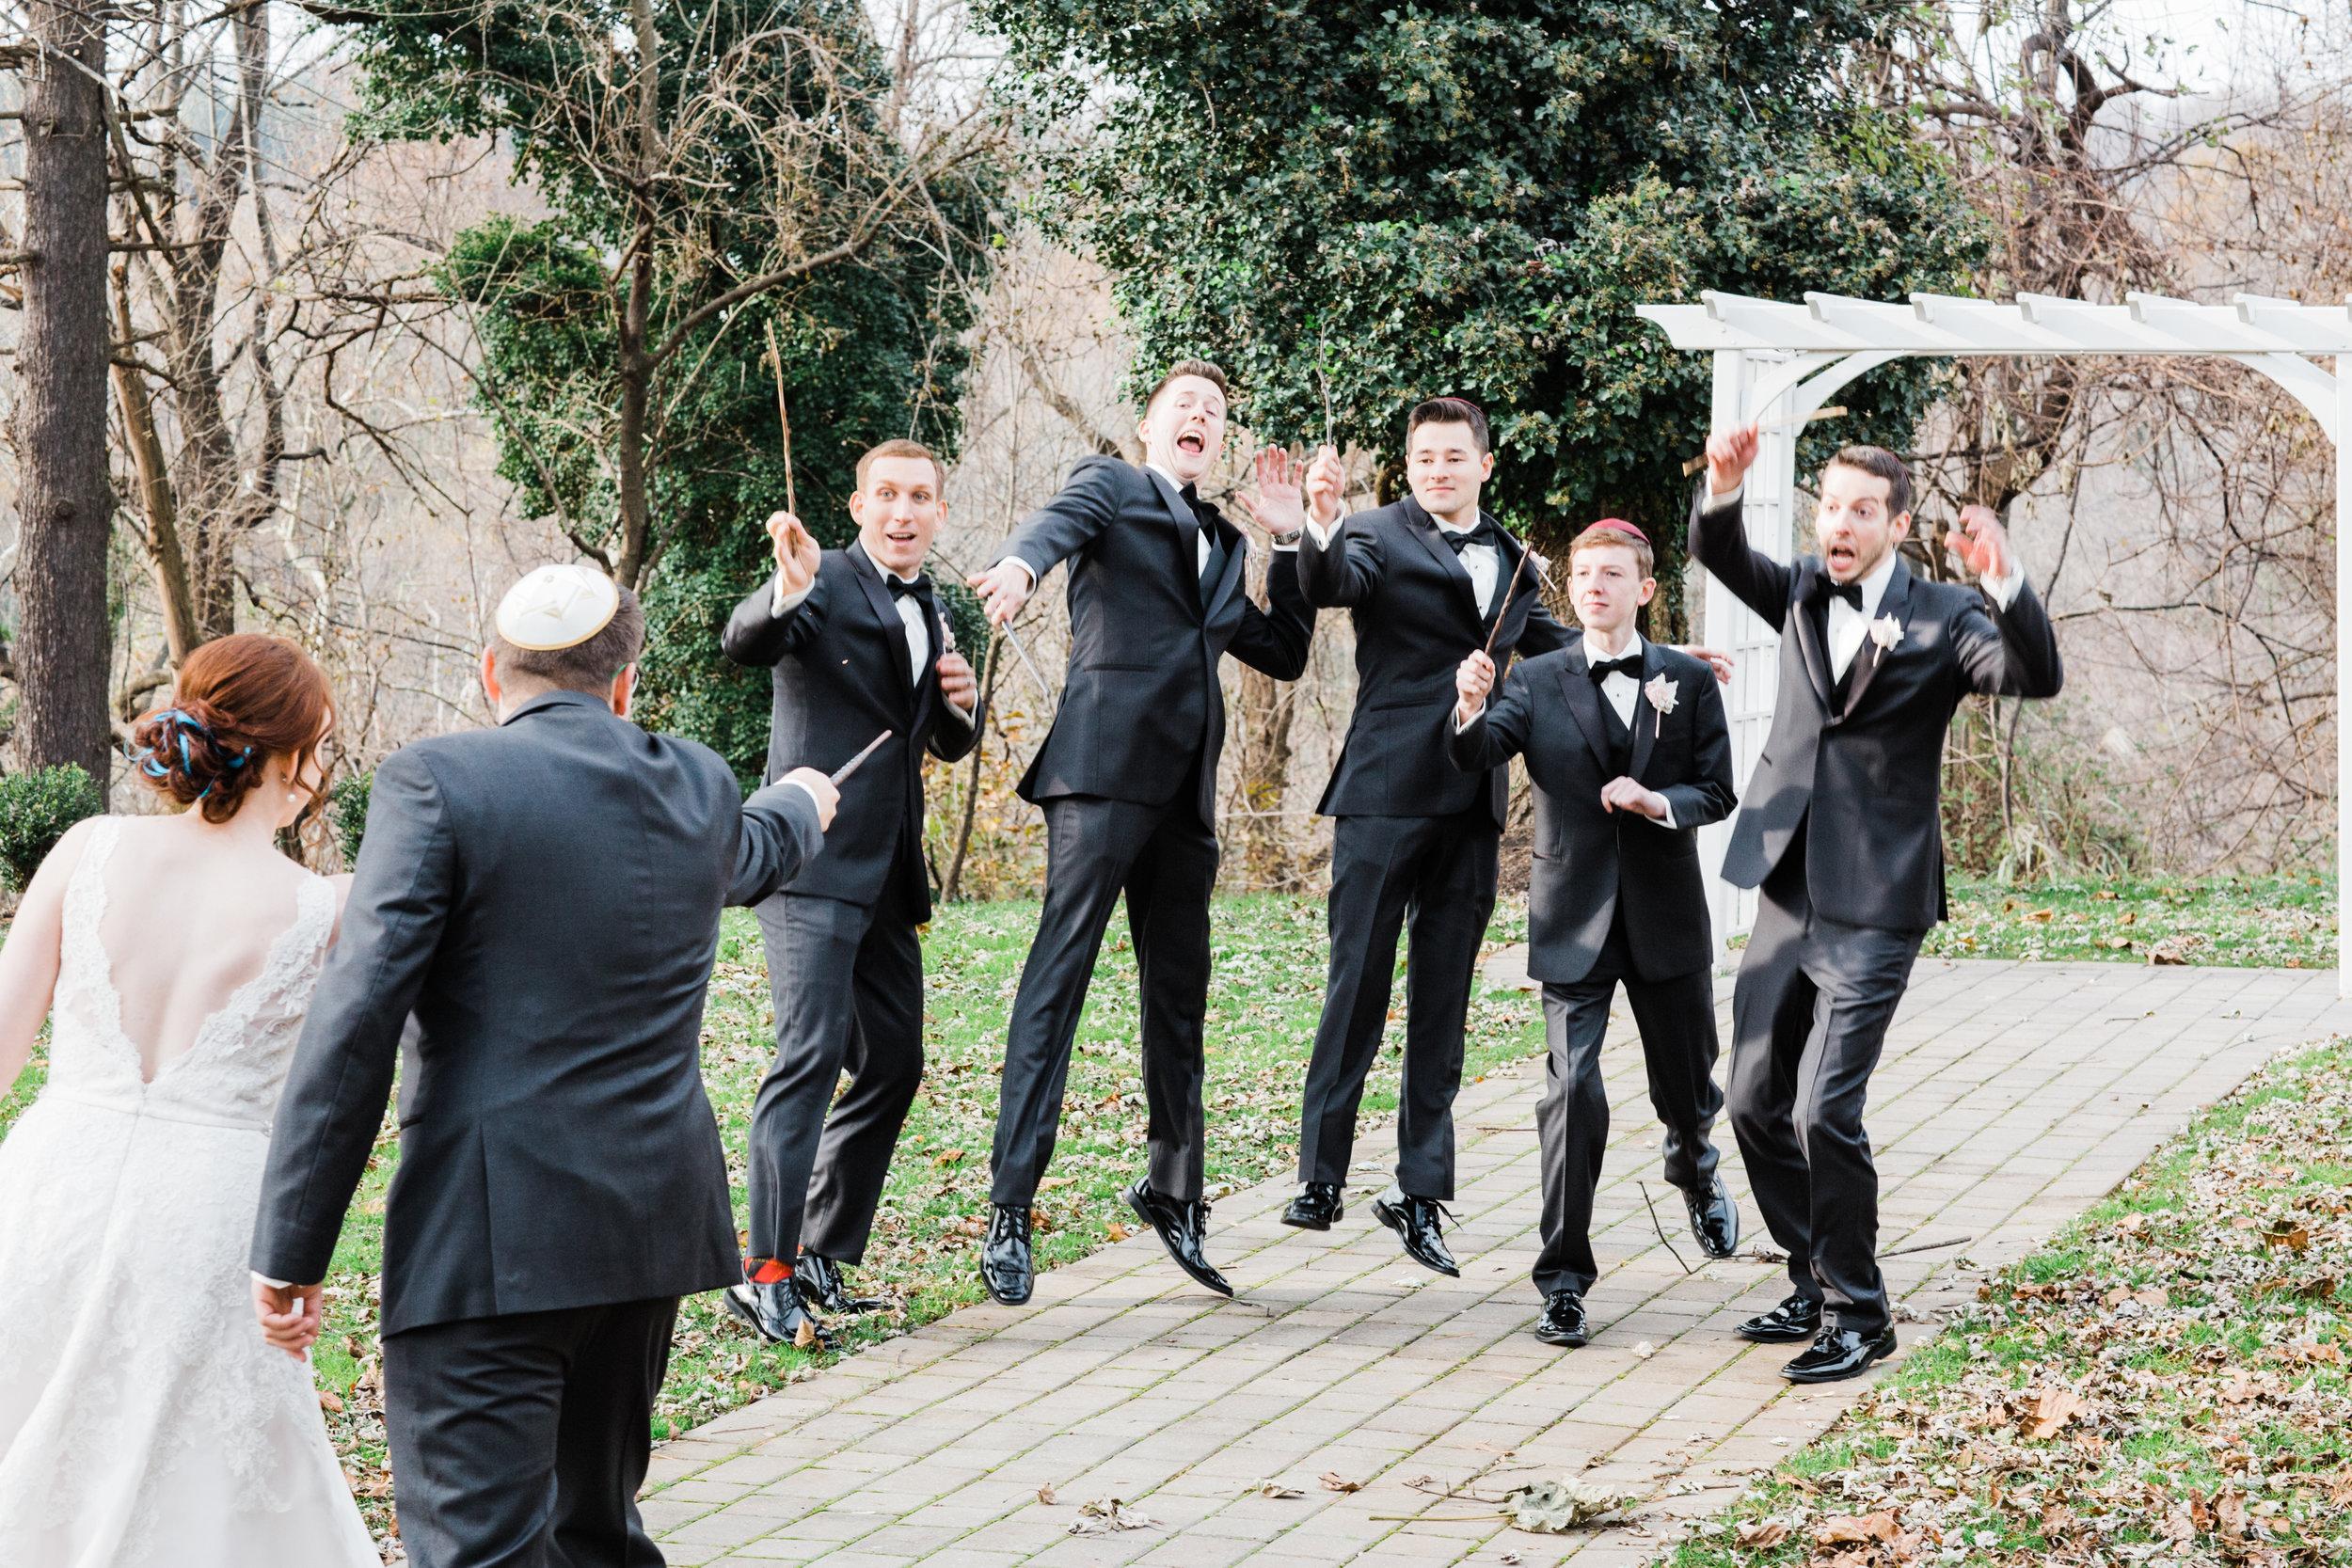 Harry Potter Wedding at Overhills Mansion Catonville Maryland Wedding Photographers Megapixels Media (58 of 134).jpg